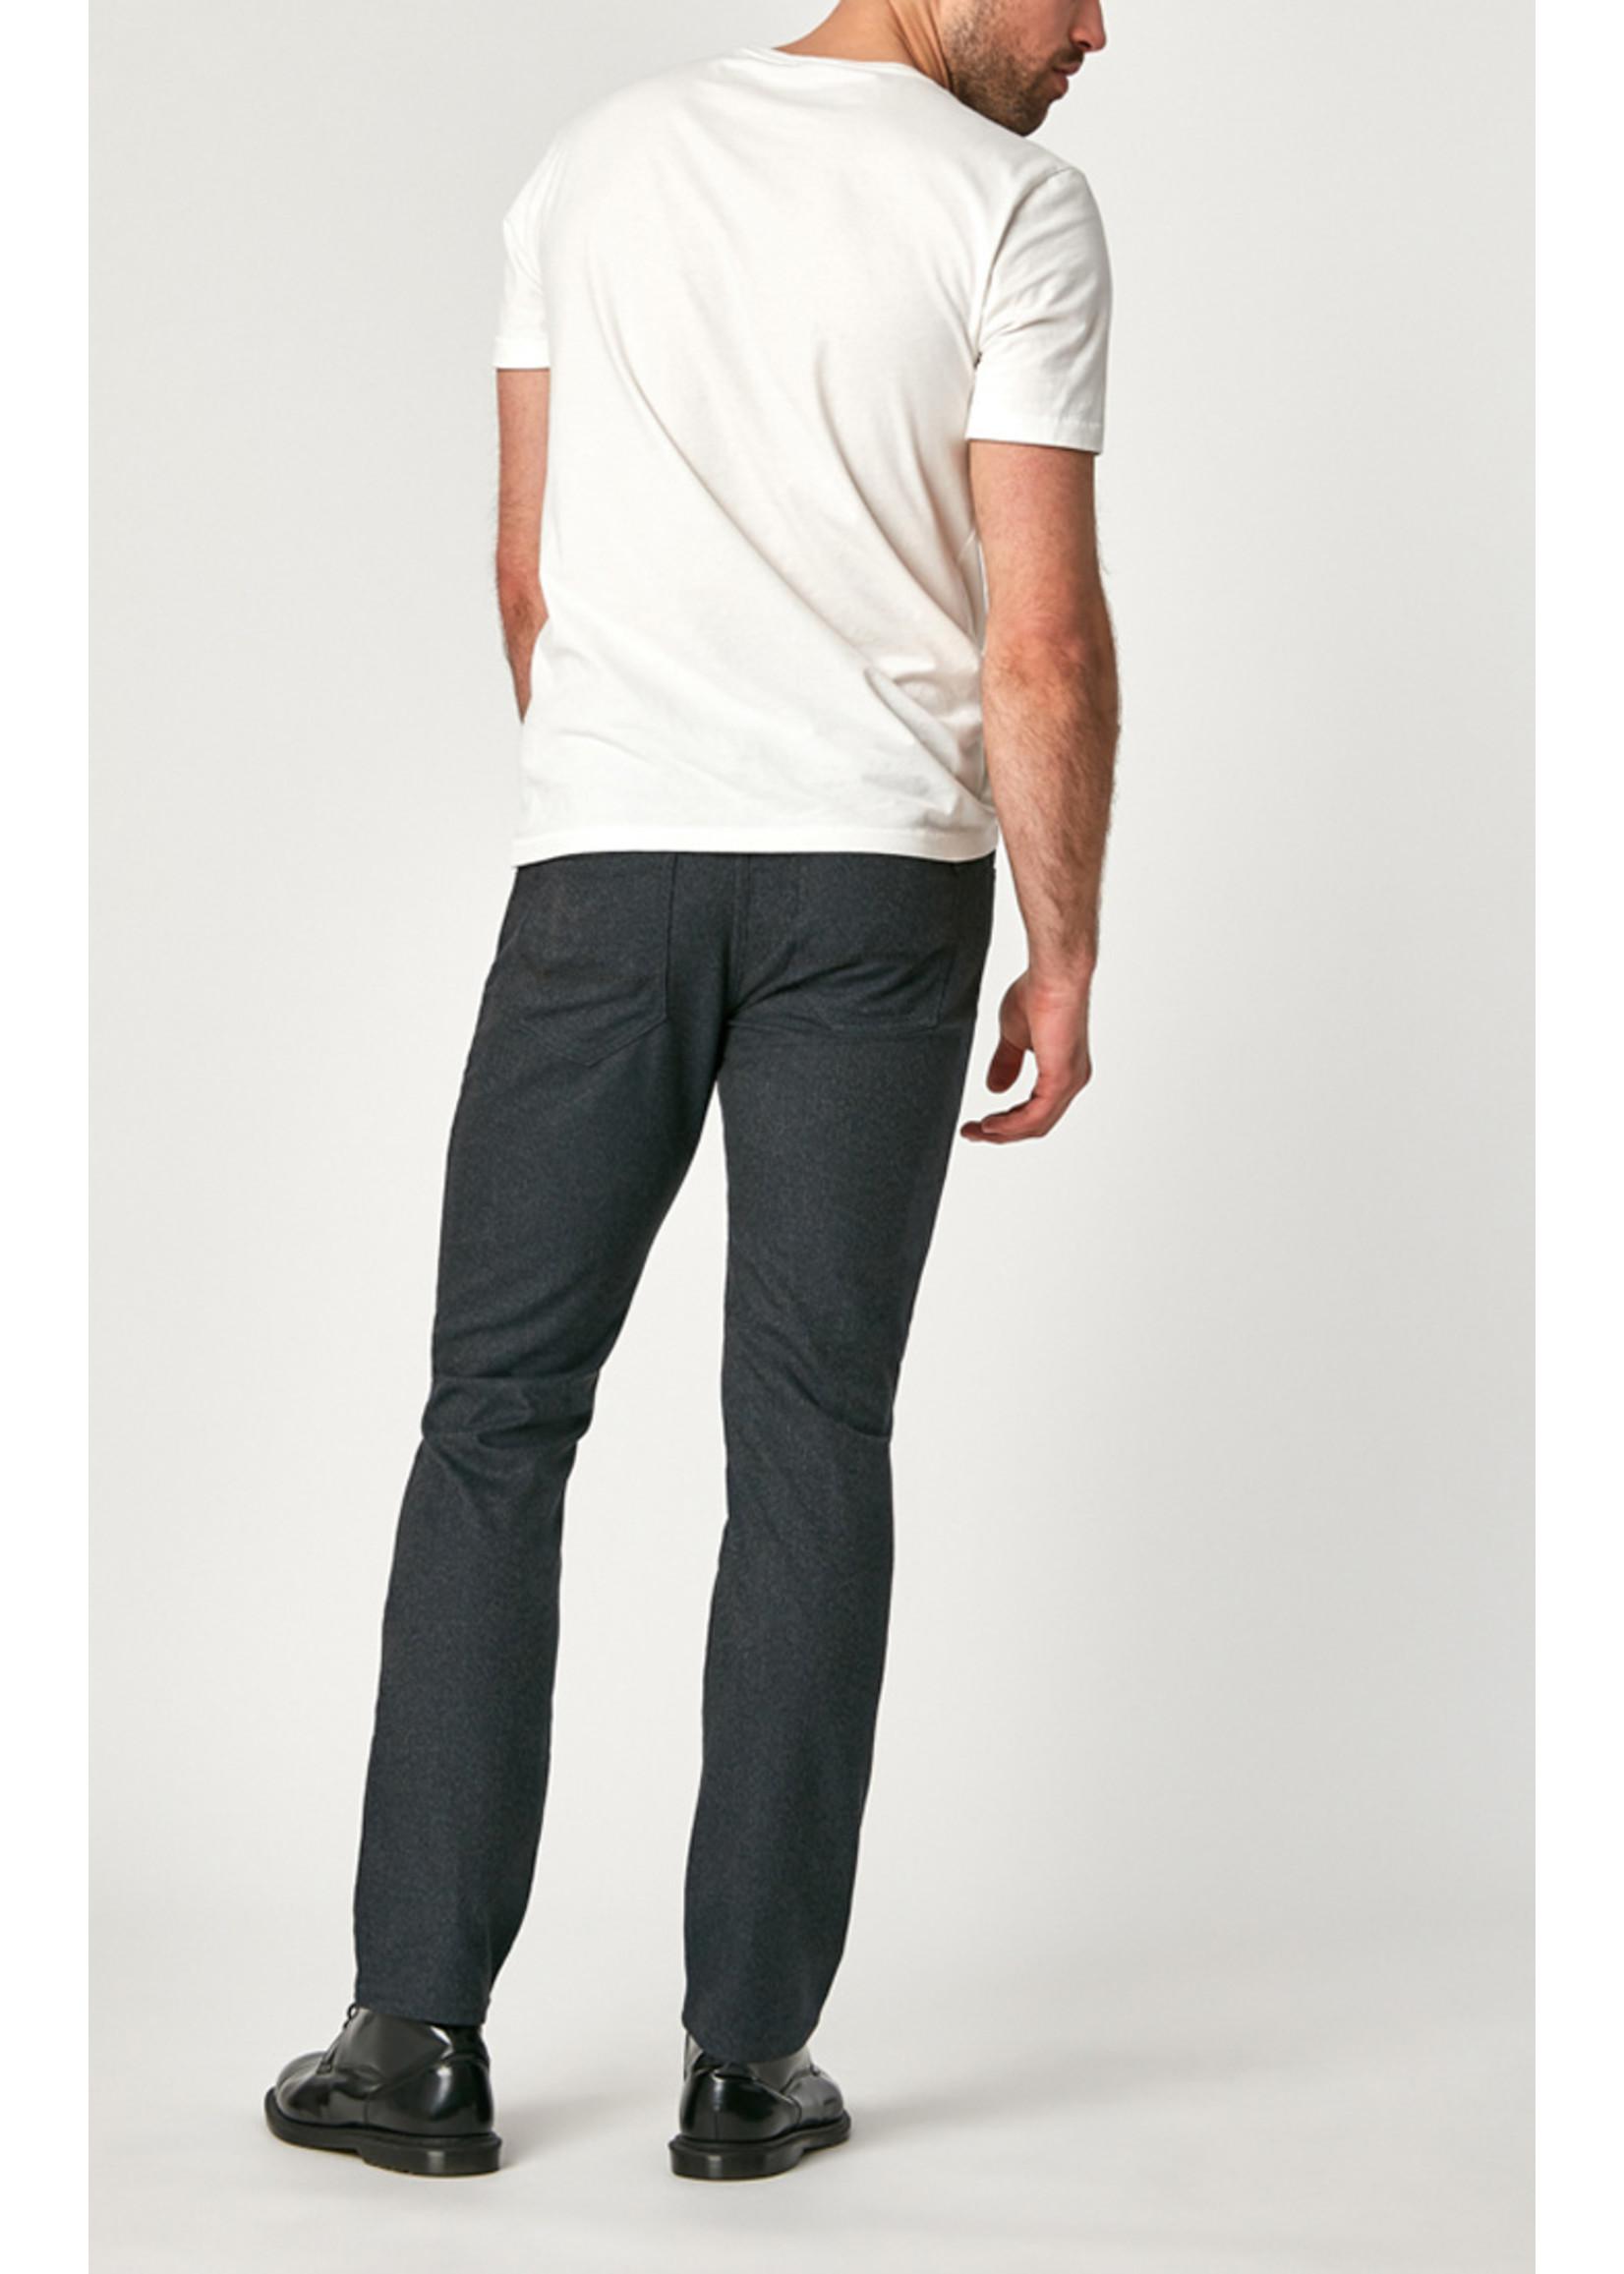 Mavi Jeans Marcus Charcoal Feather Tweed